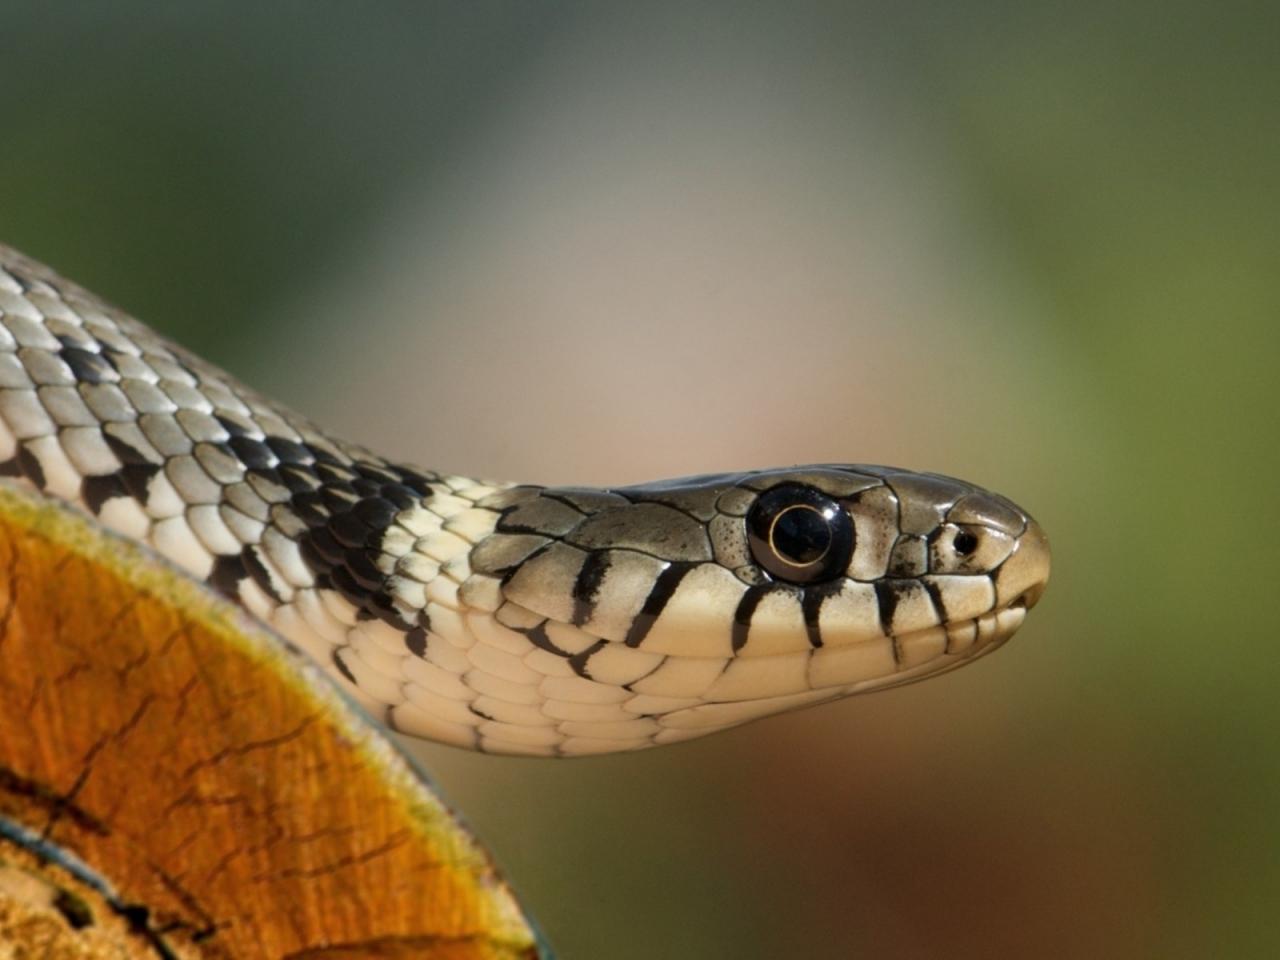 Una cobra - 1280x960